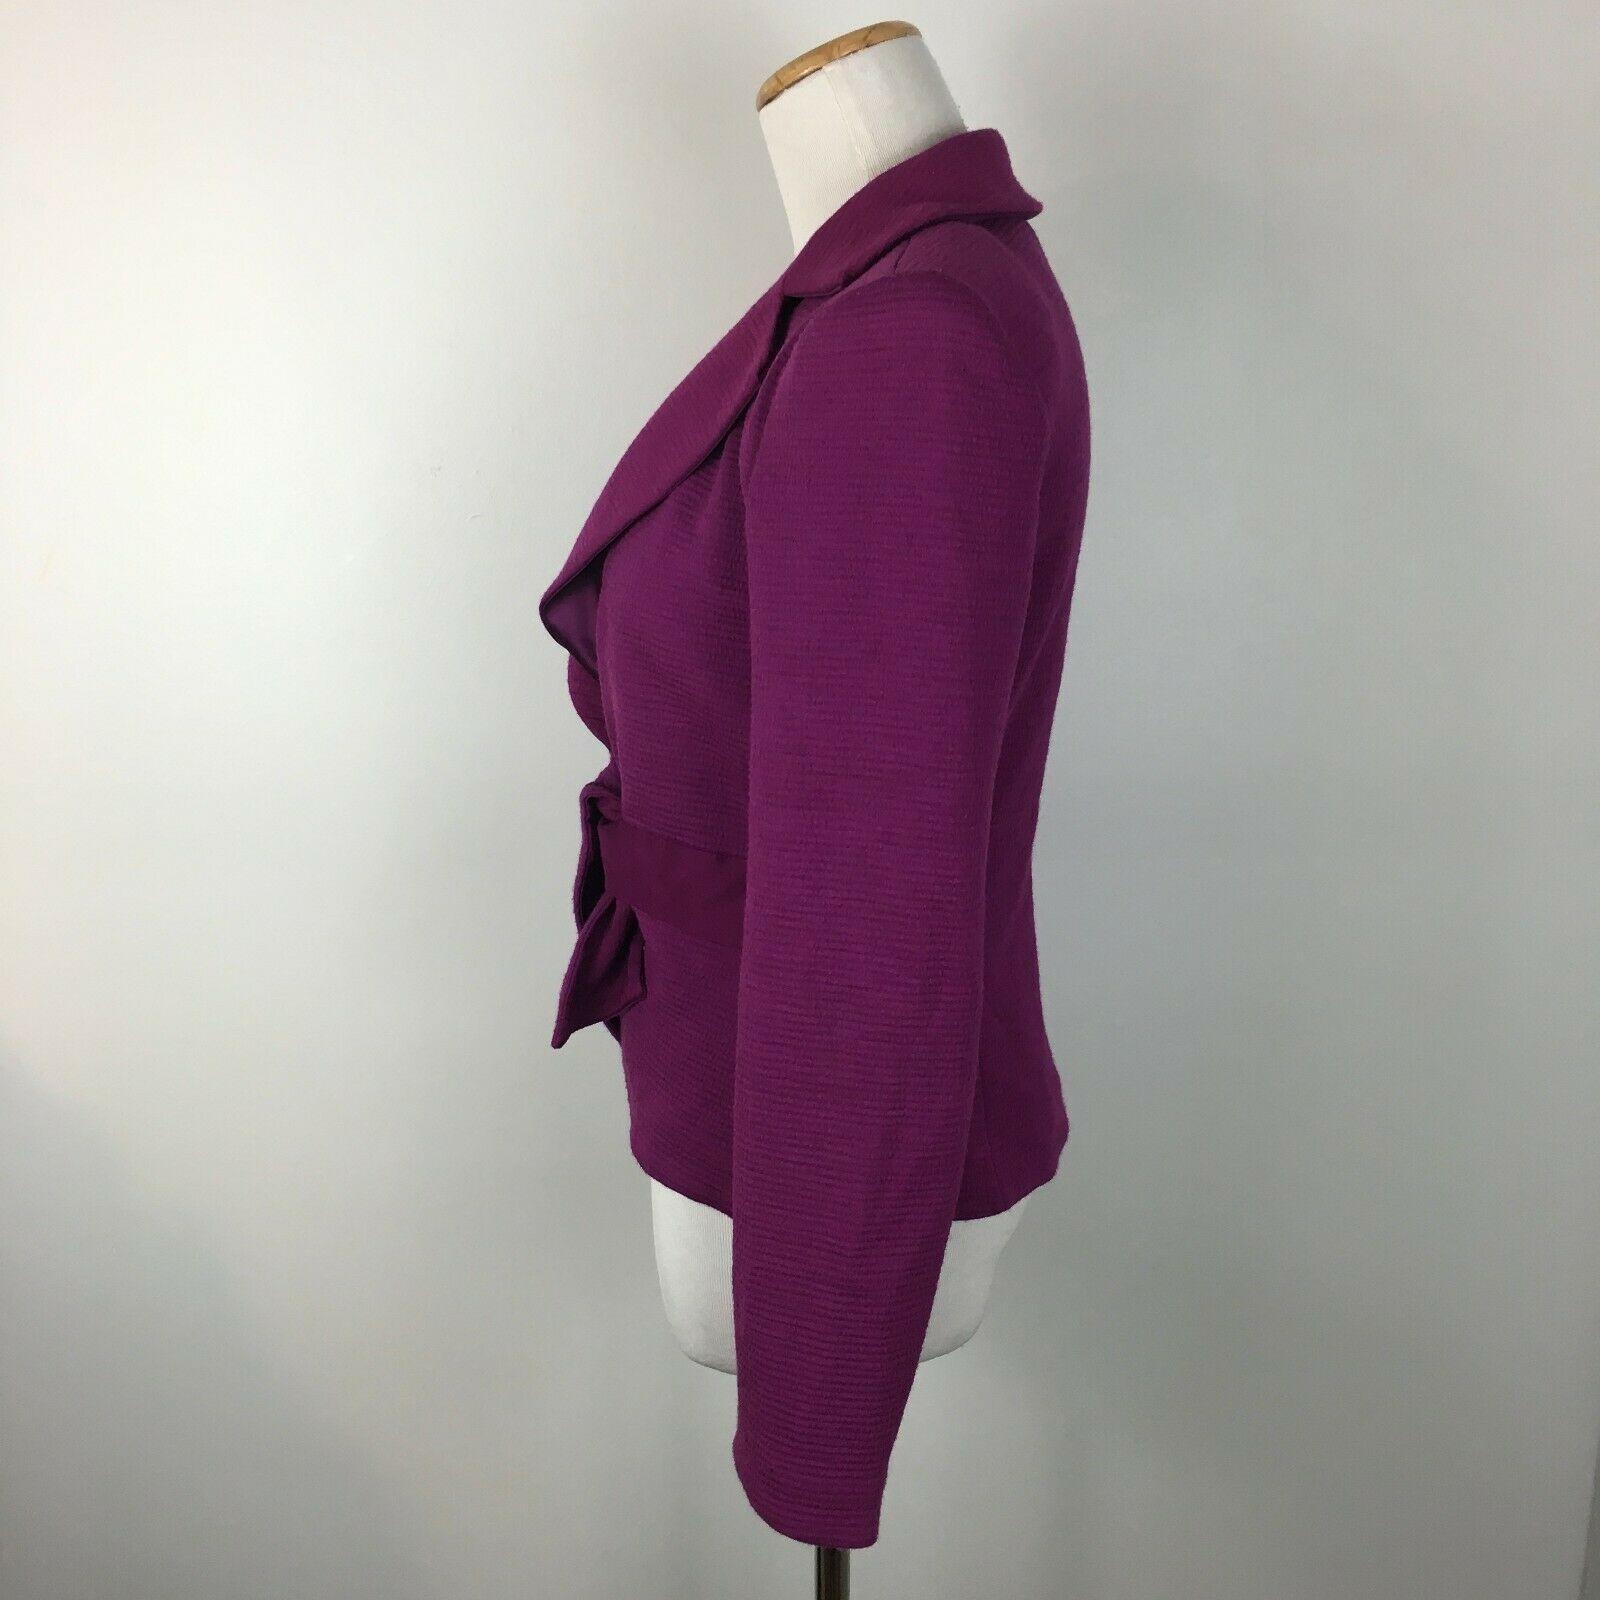 Armani Collezioni Women's Purple Knit Soft Tie Front Blazer Jacket Size 6